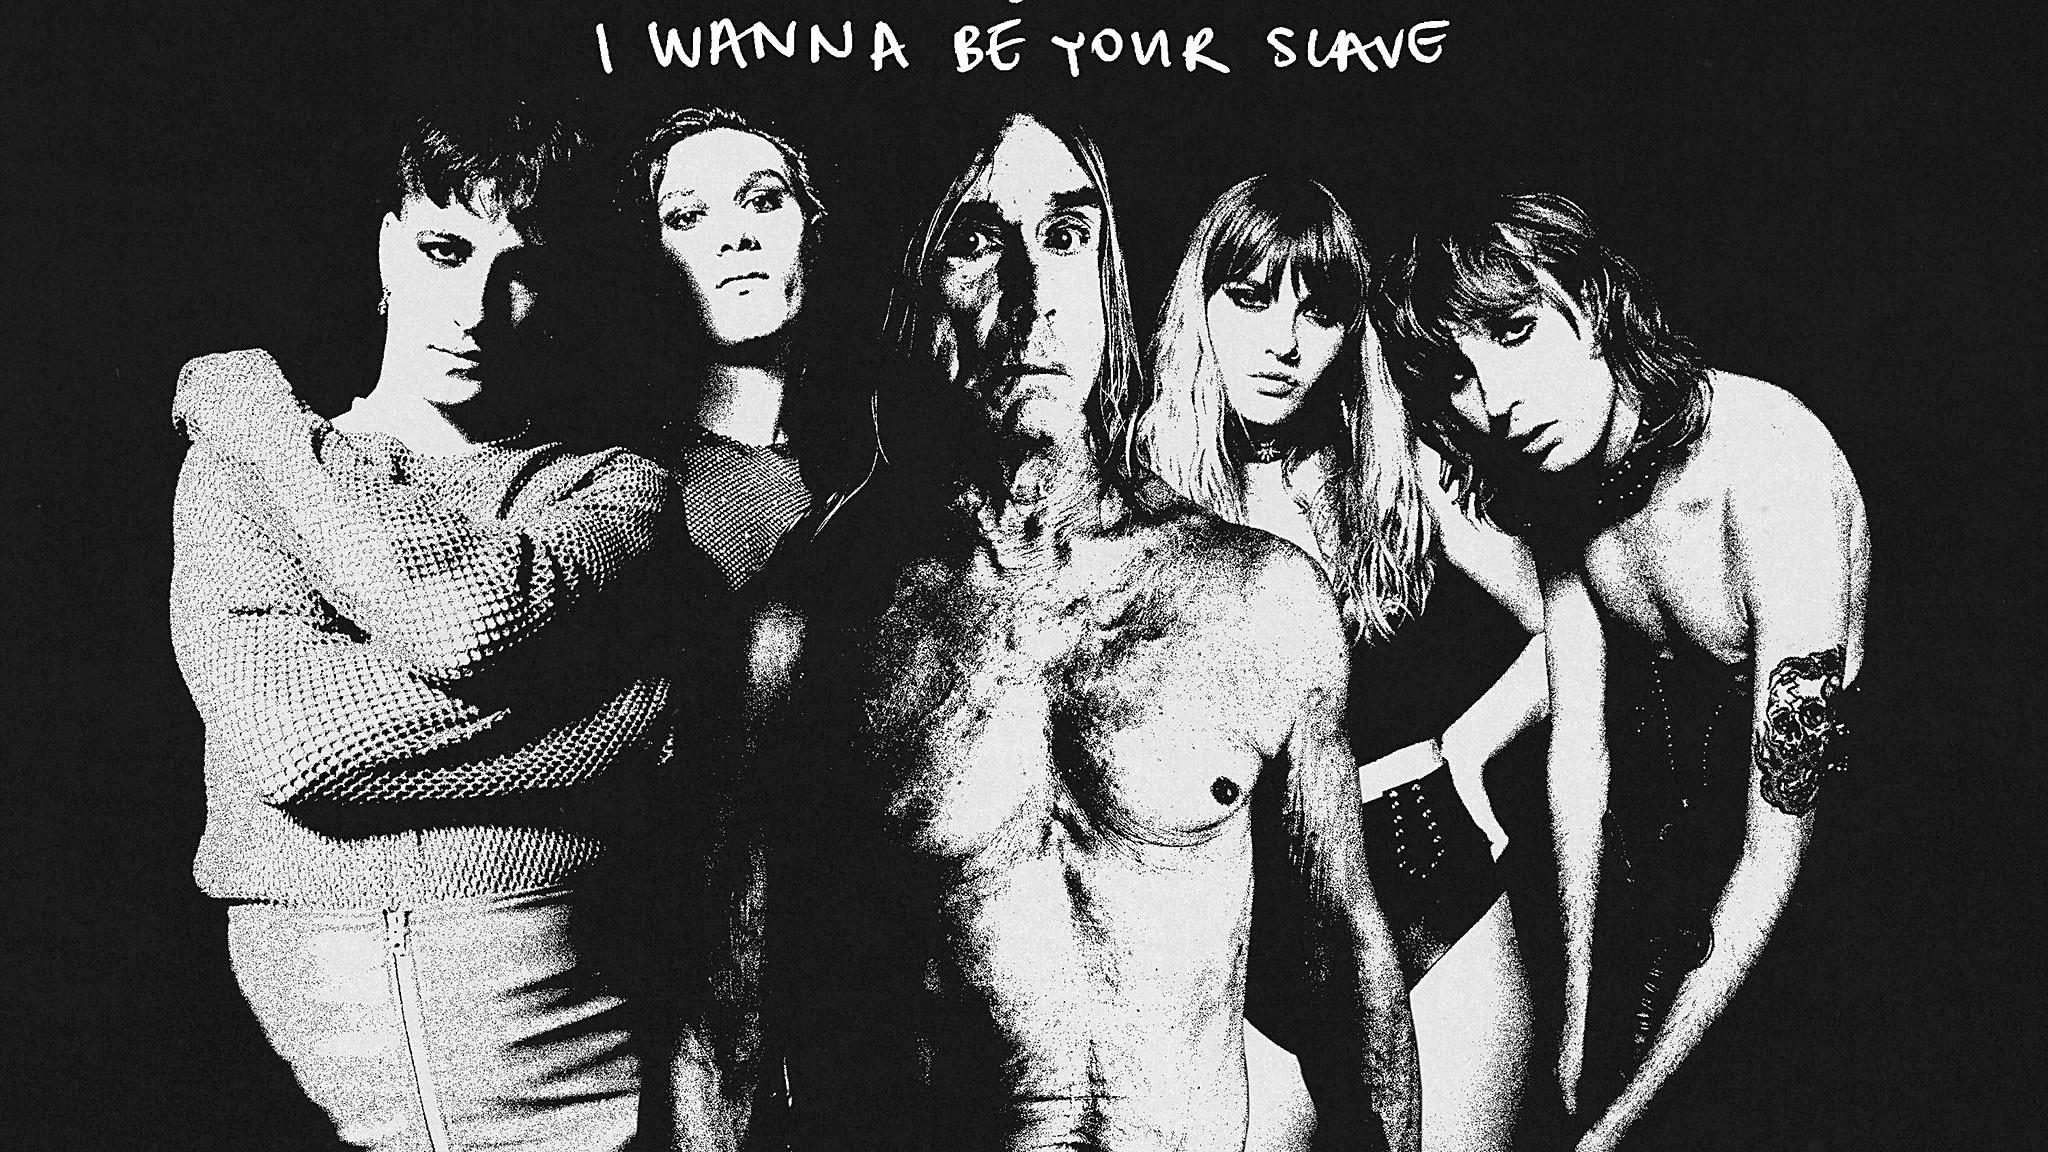 Måneskin Maneskin Iggy Pop I Wanna Be Your Slave